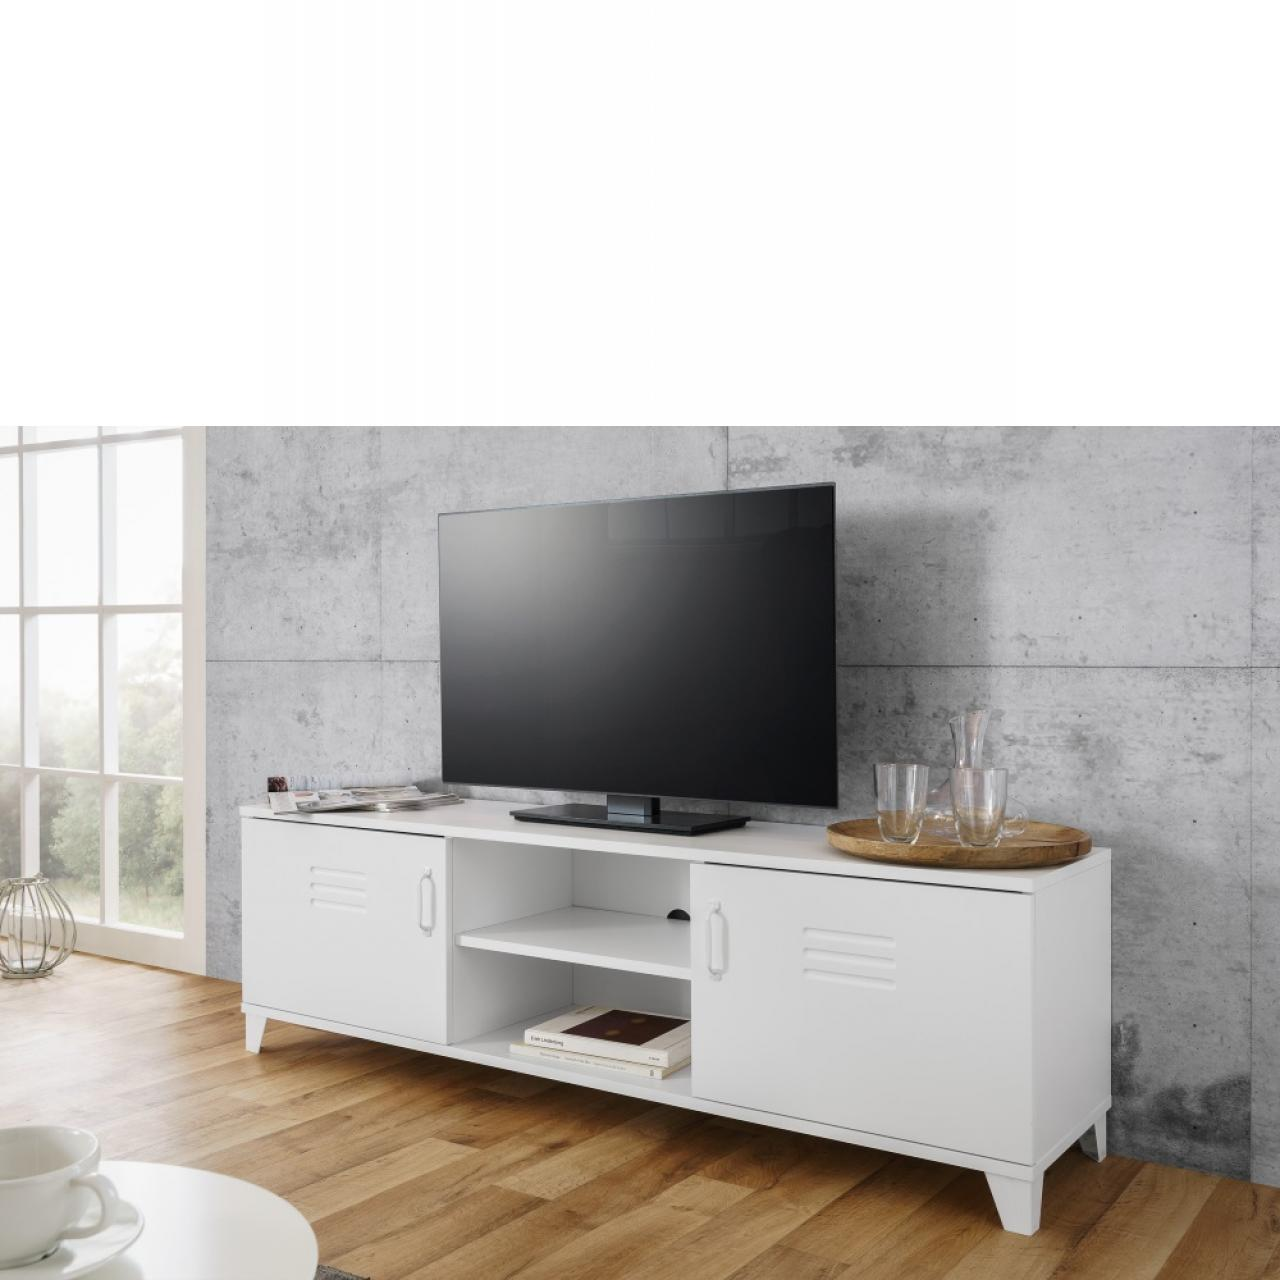 TV-Lowboard - Factory - weiß